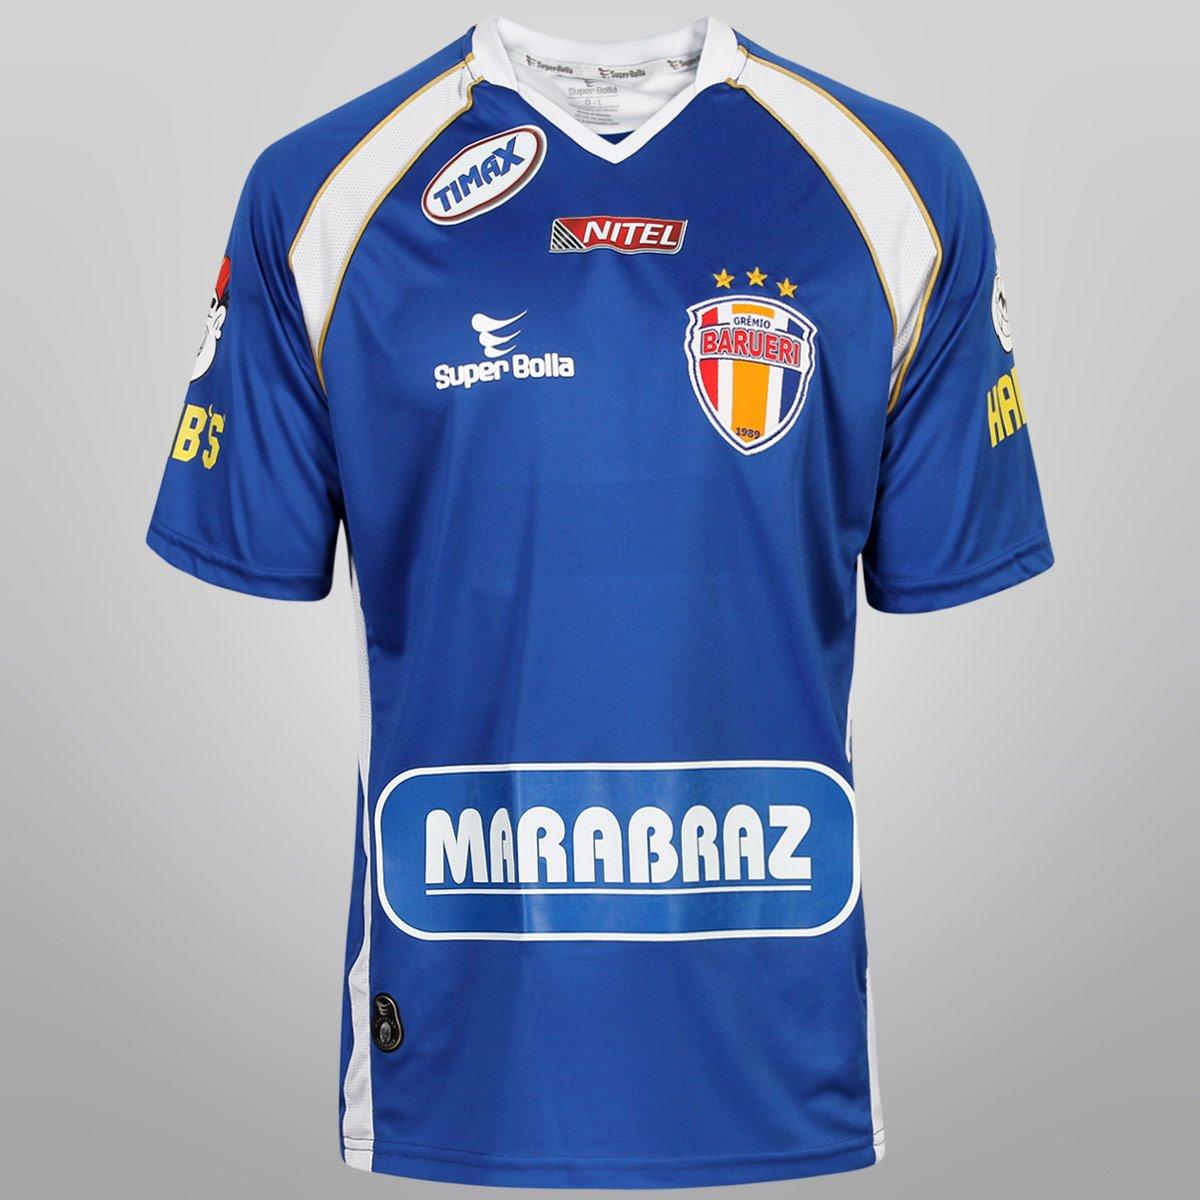 Camisa Super Bolla Grêmio Barueri II 13 14 nº 10 - c  Patrocínio - Compre  Agora  df626d9369e9f